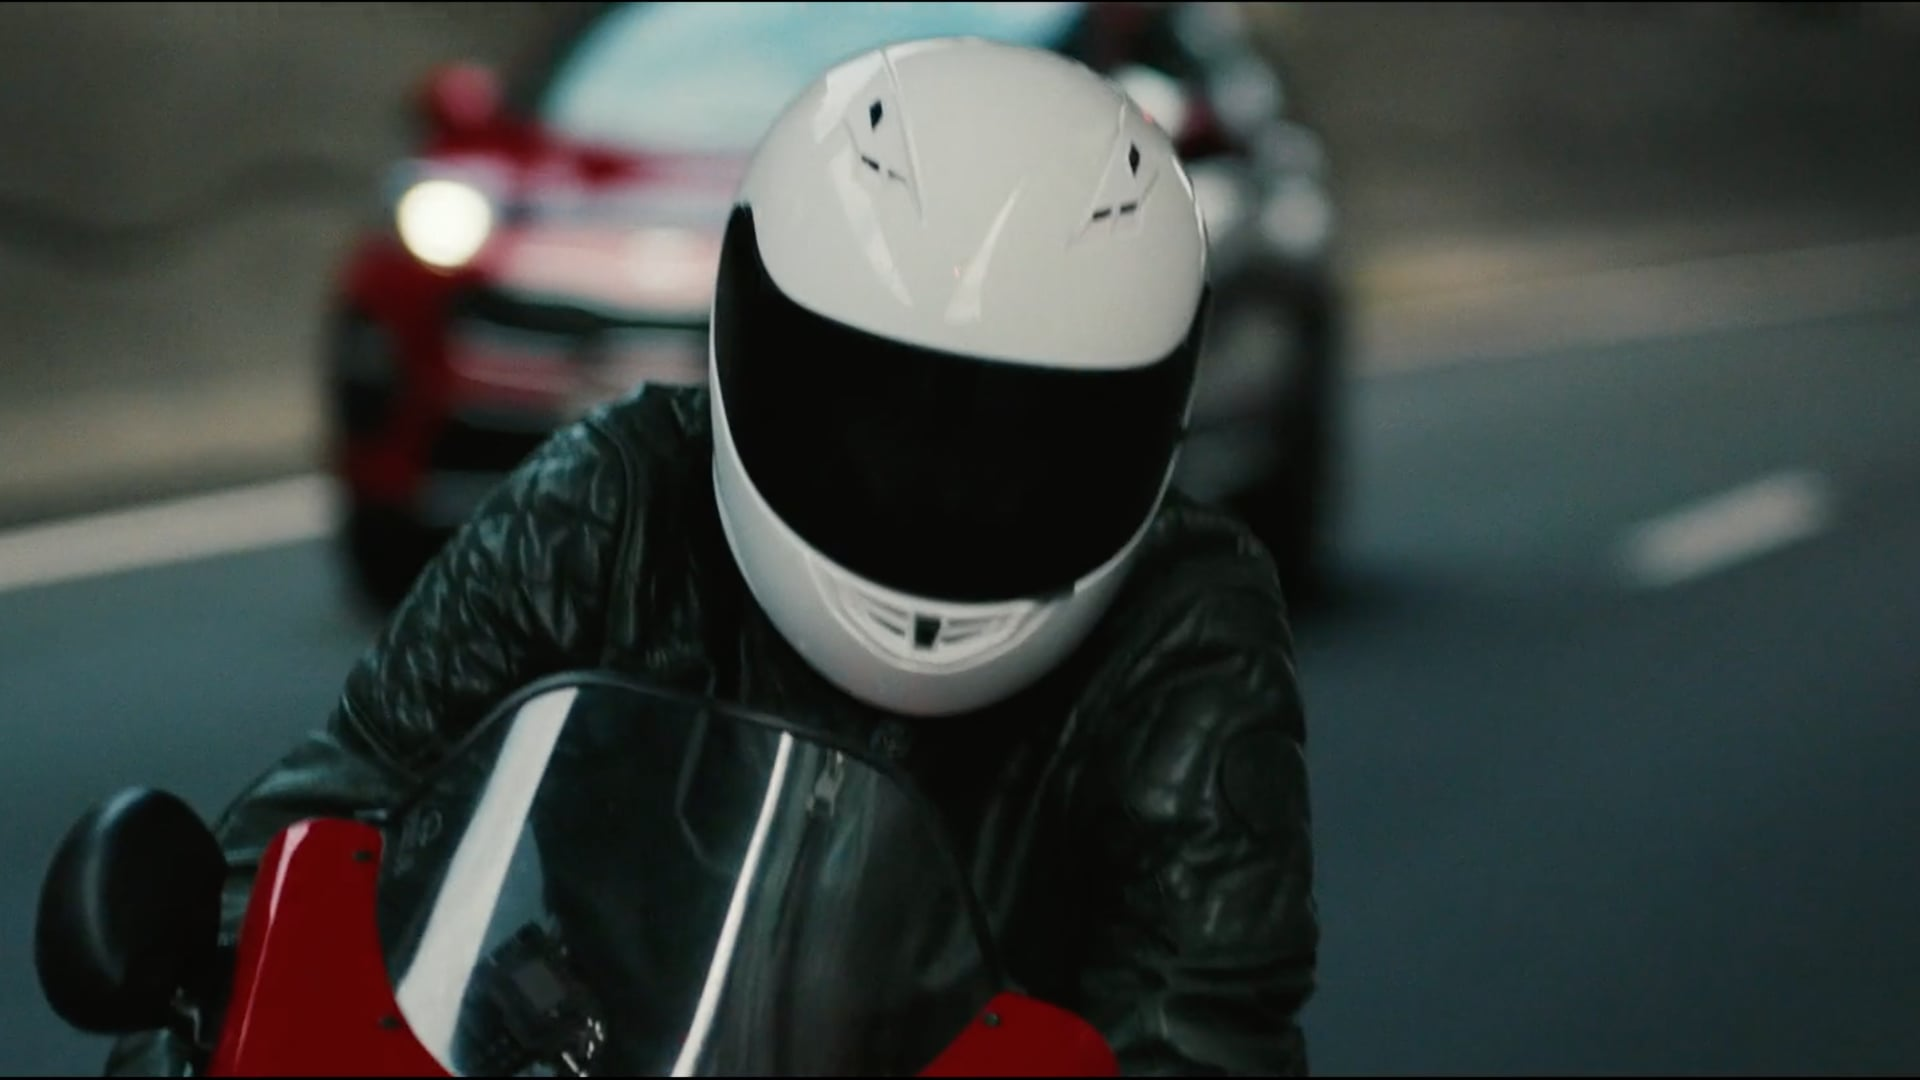 RYAN HERON | NEW ZEALAND - Respect Every Ride